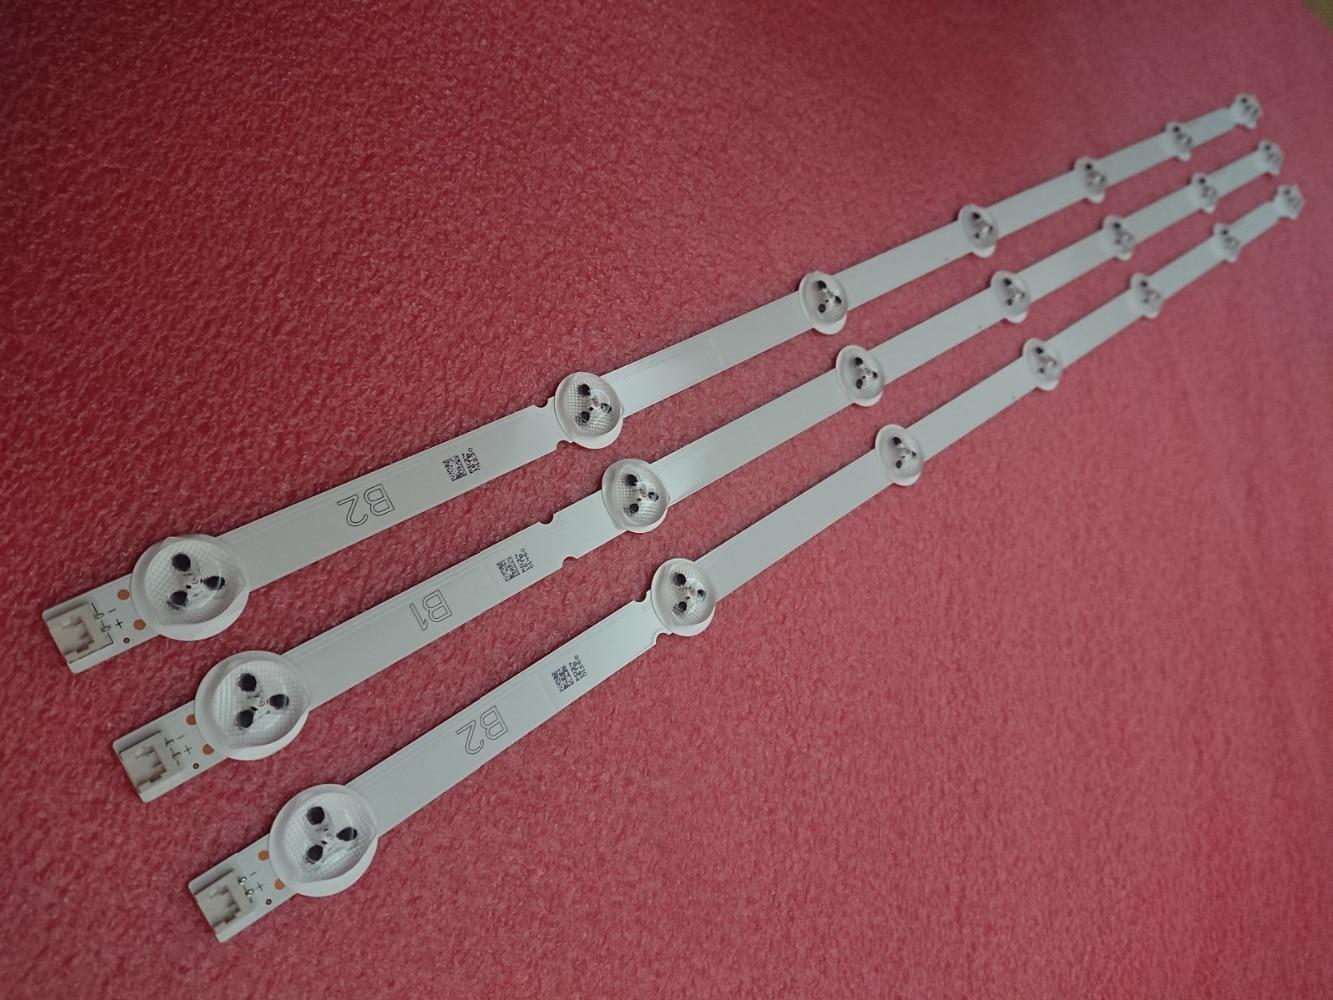 Image 4 - New Original 3 PCS*7LED 630mm B1 B2 LED Backlight Strip for LG 32LN541V 32LN540V 6916L 1437A 6916L 1438A LC320DUE SF R1-in LED Strips from Lights & Lighting